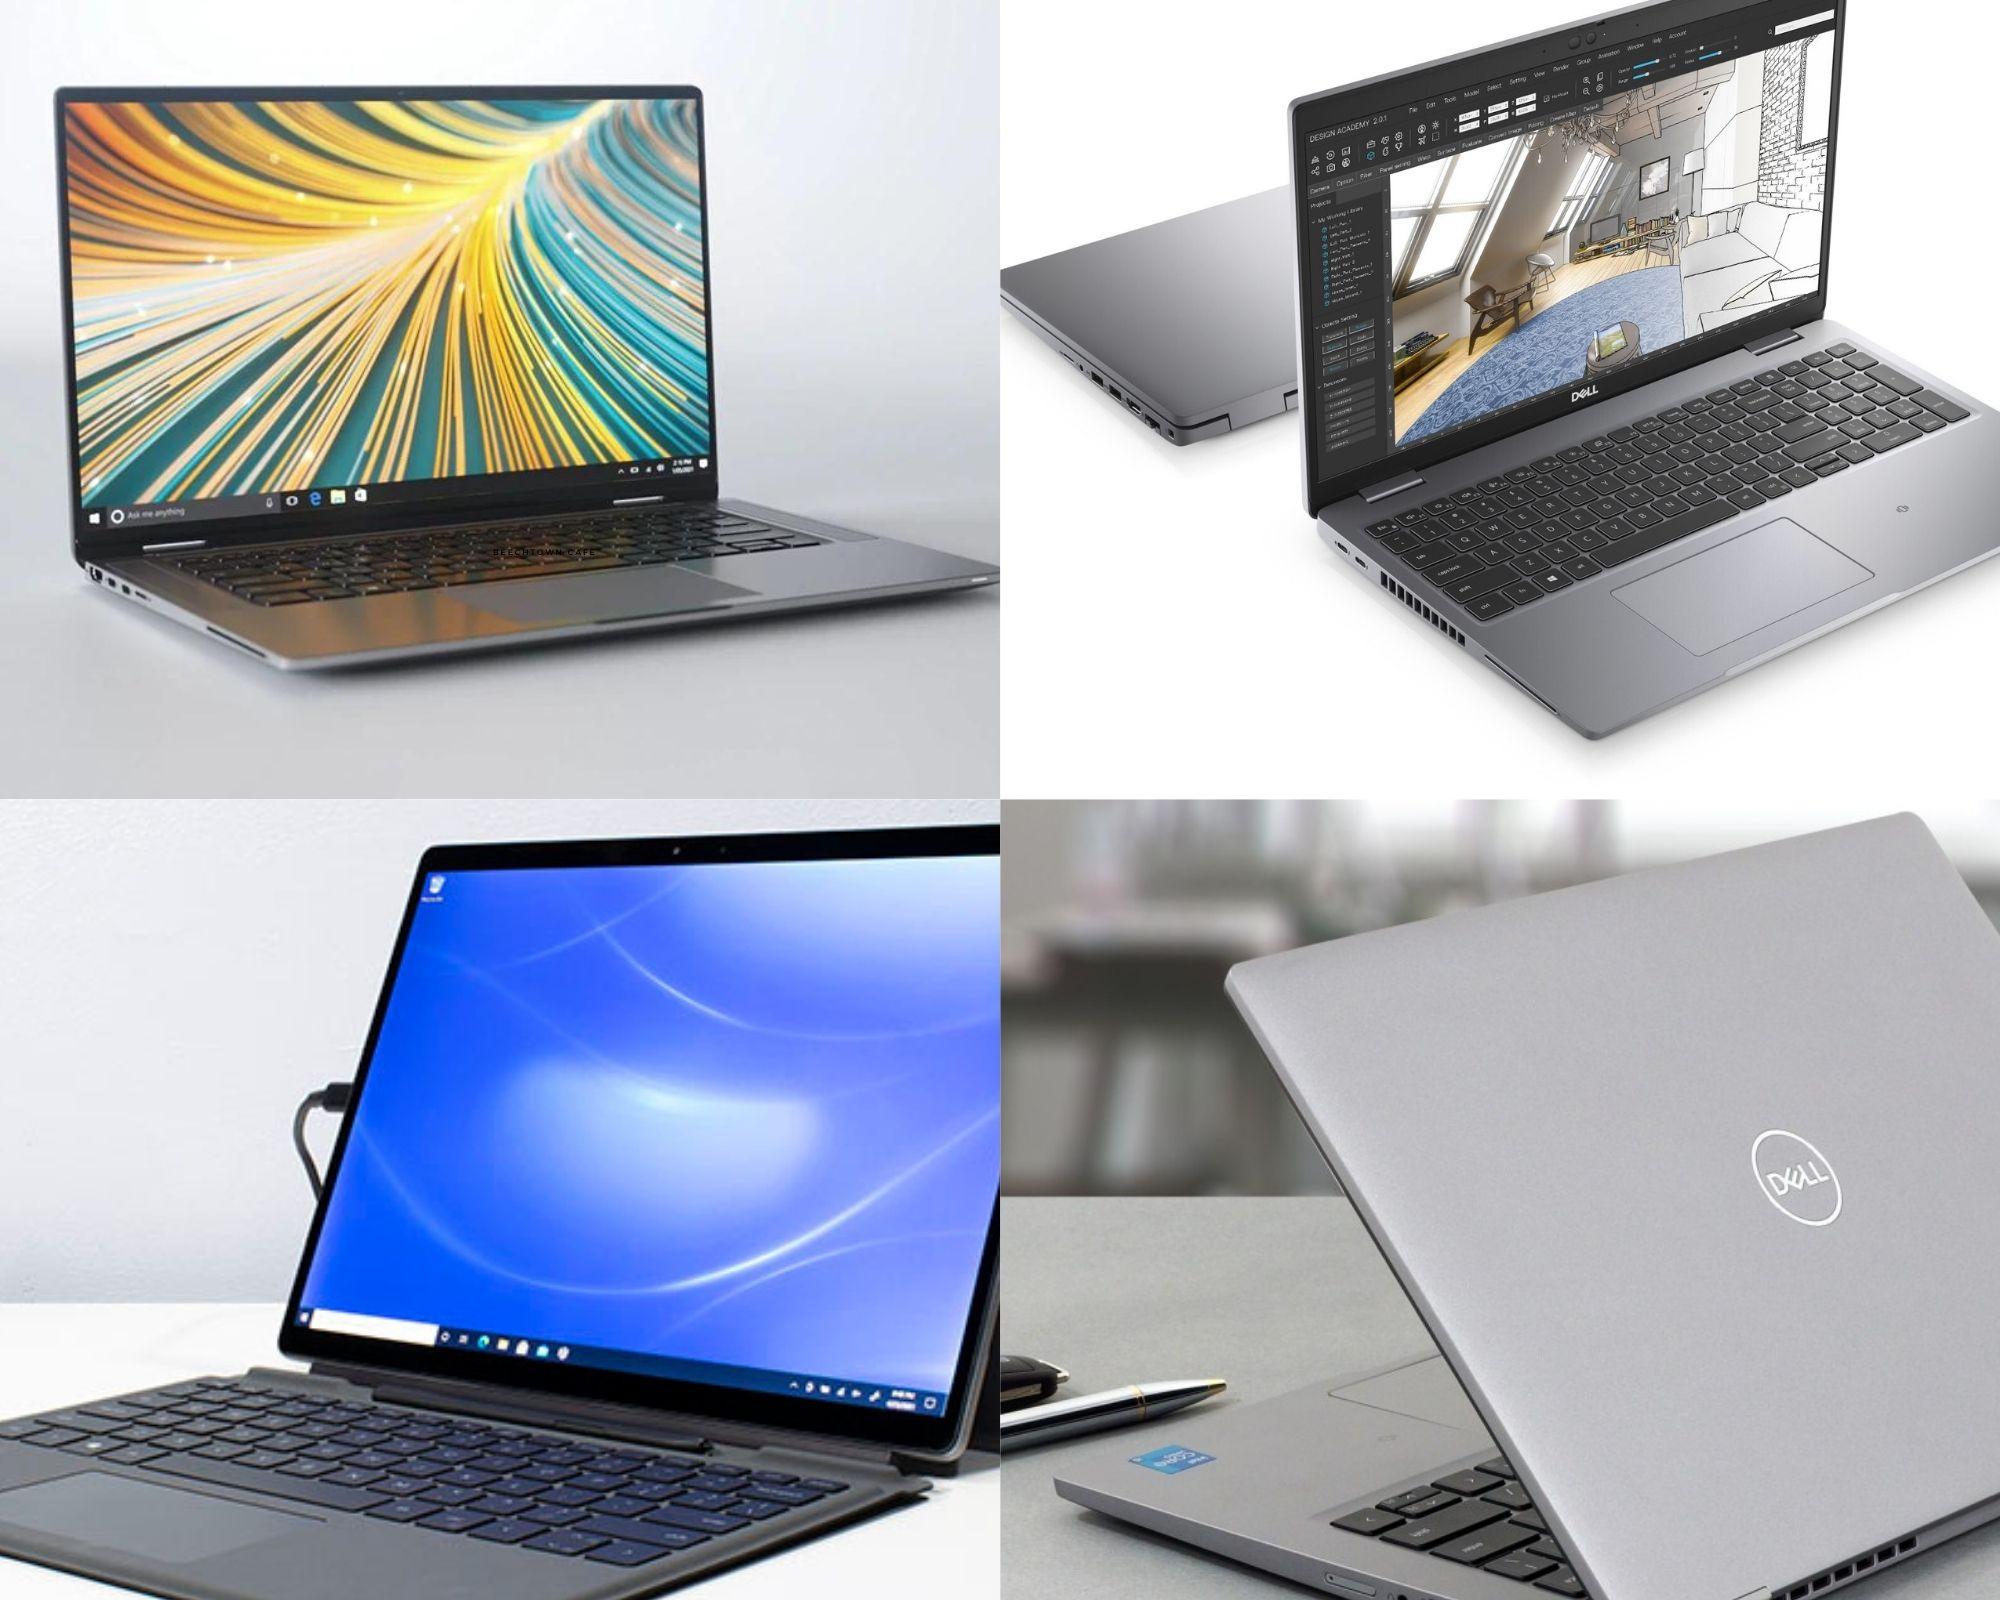 Dell Latitude Precision OptiPlex Laptop Desktop Launched in India